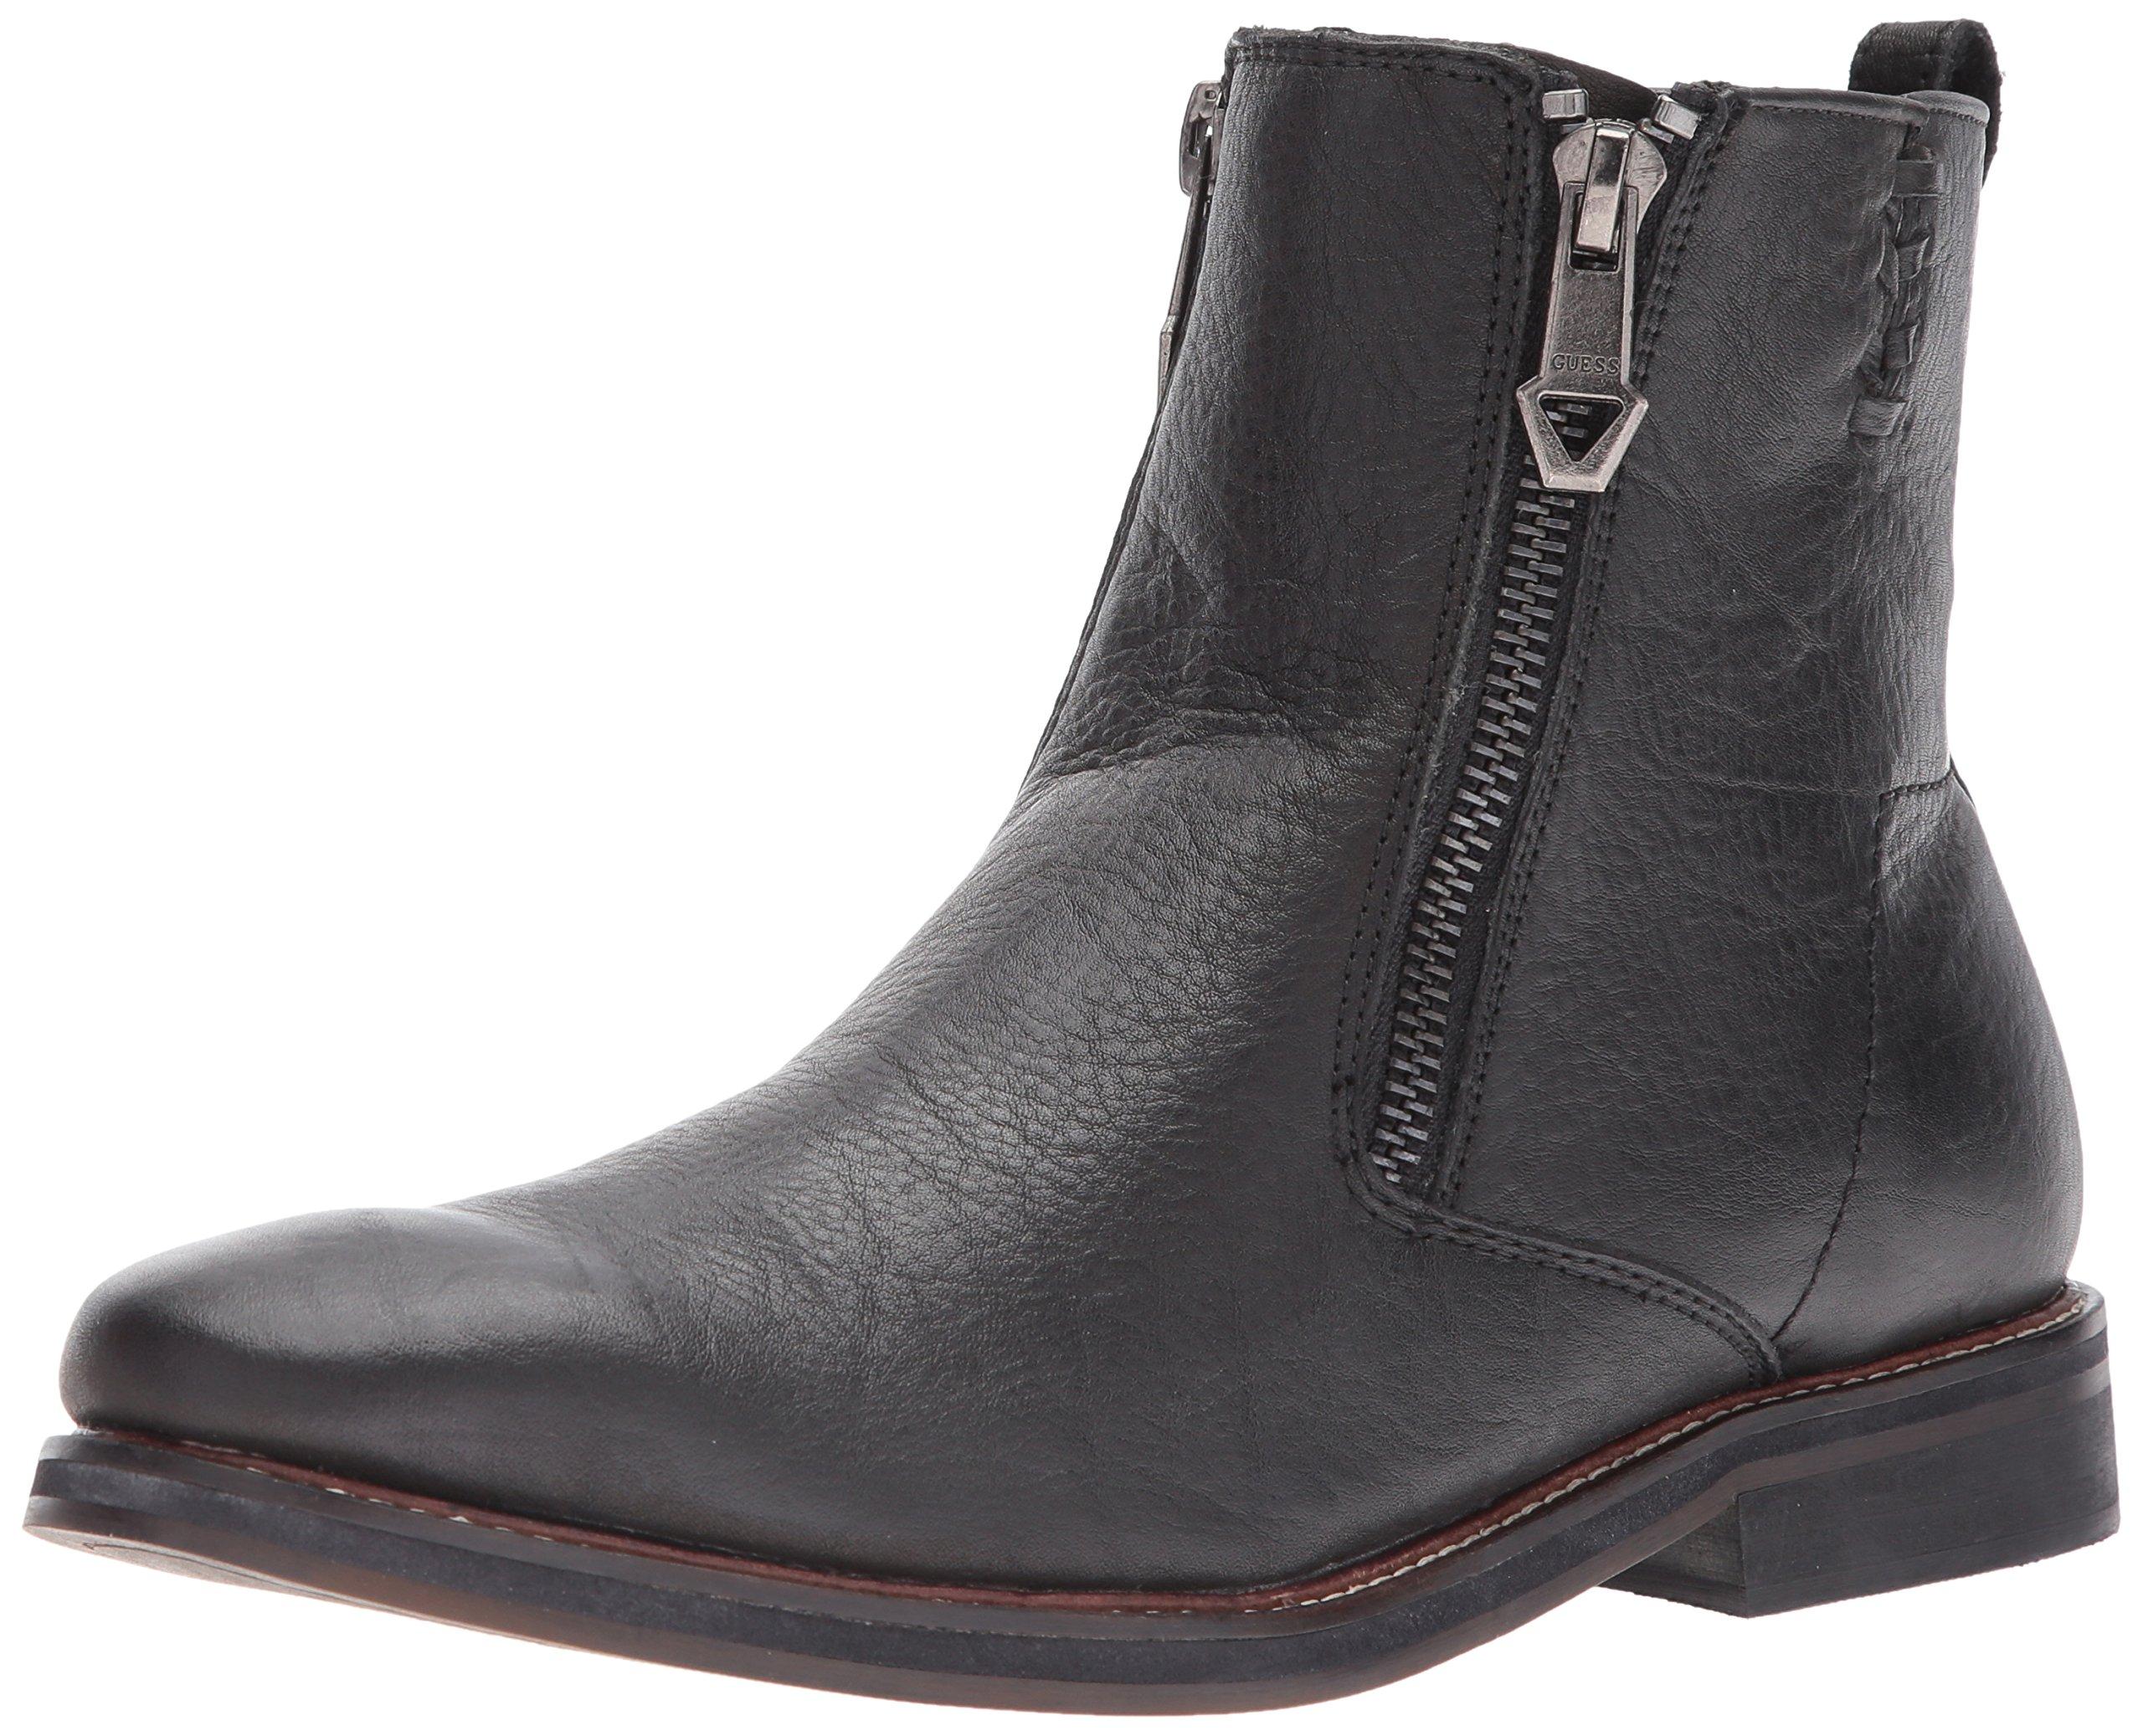 GUESS Men's Jears Chelsea Boot, Black, 11 Medium US